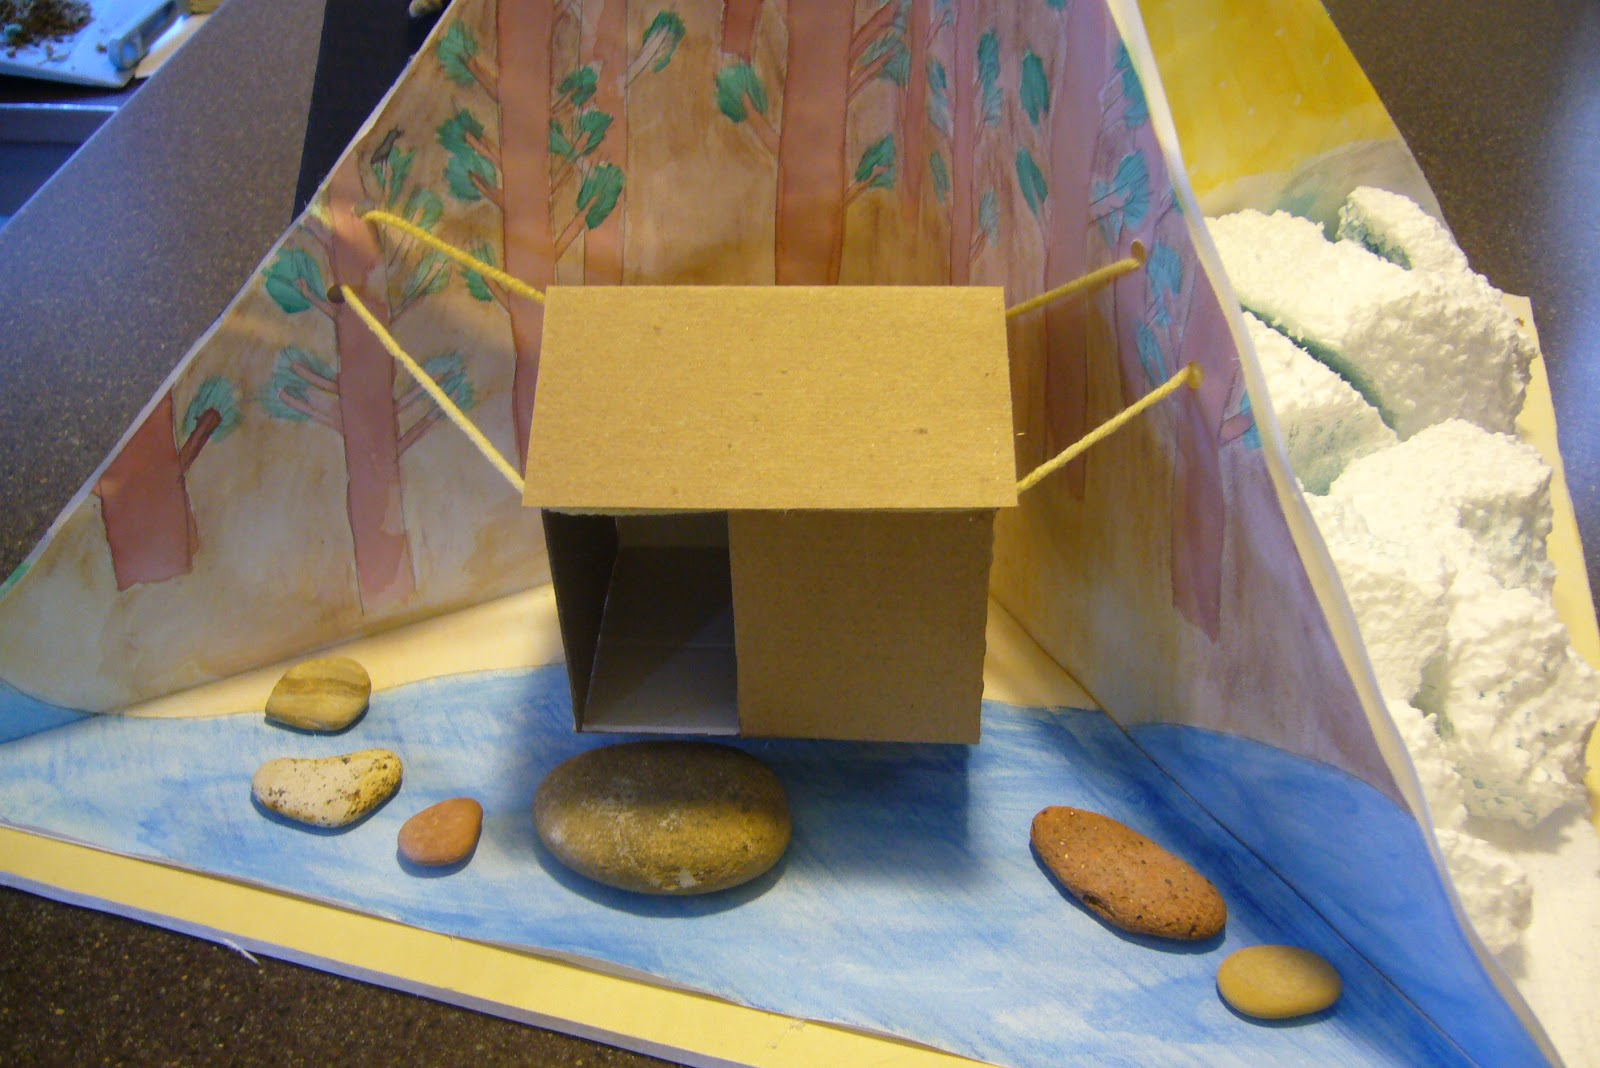 Holly S Creativity Blog School Project 4 Quadrant Diorama